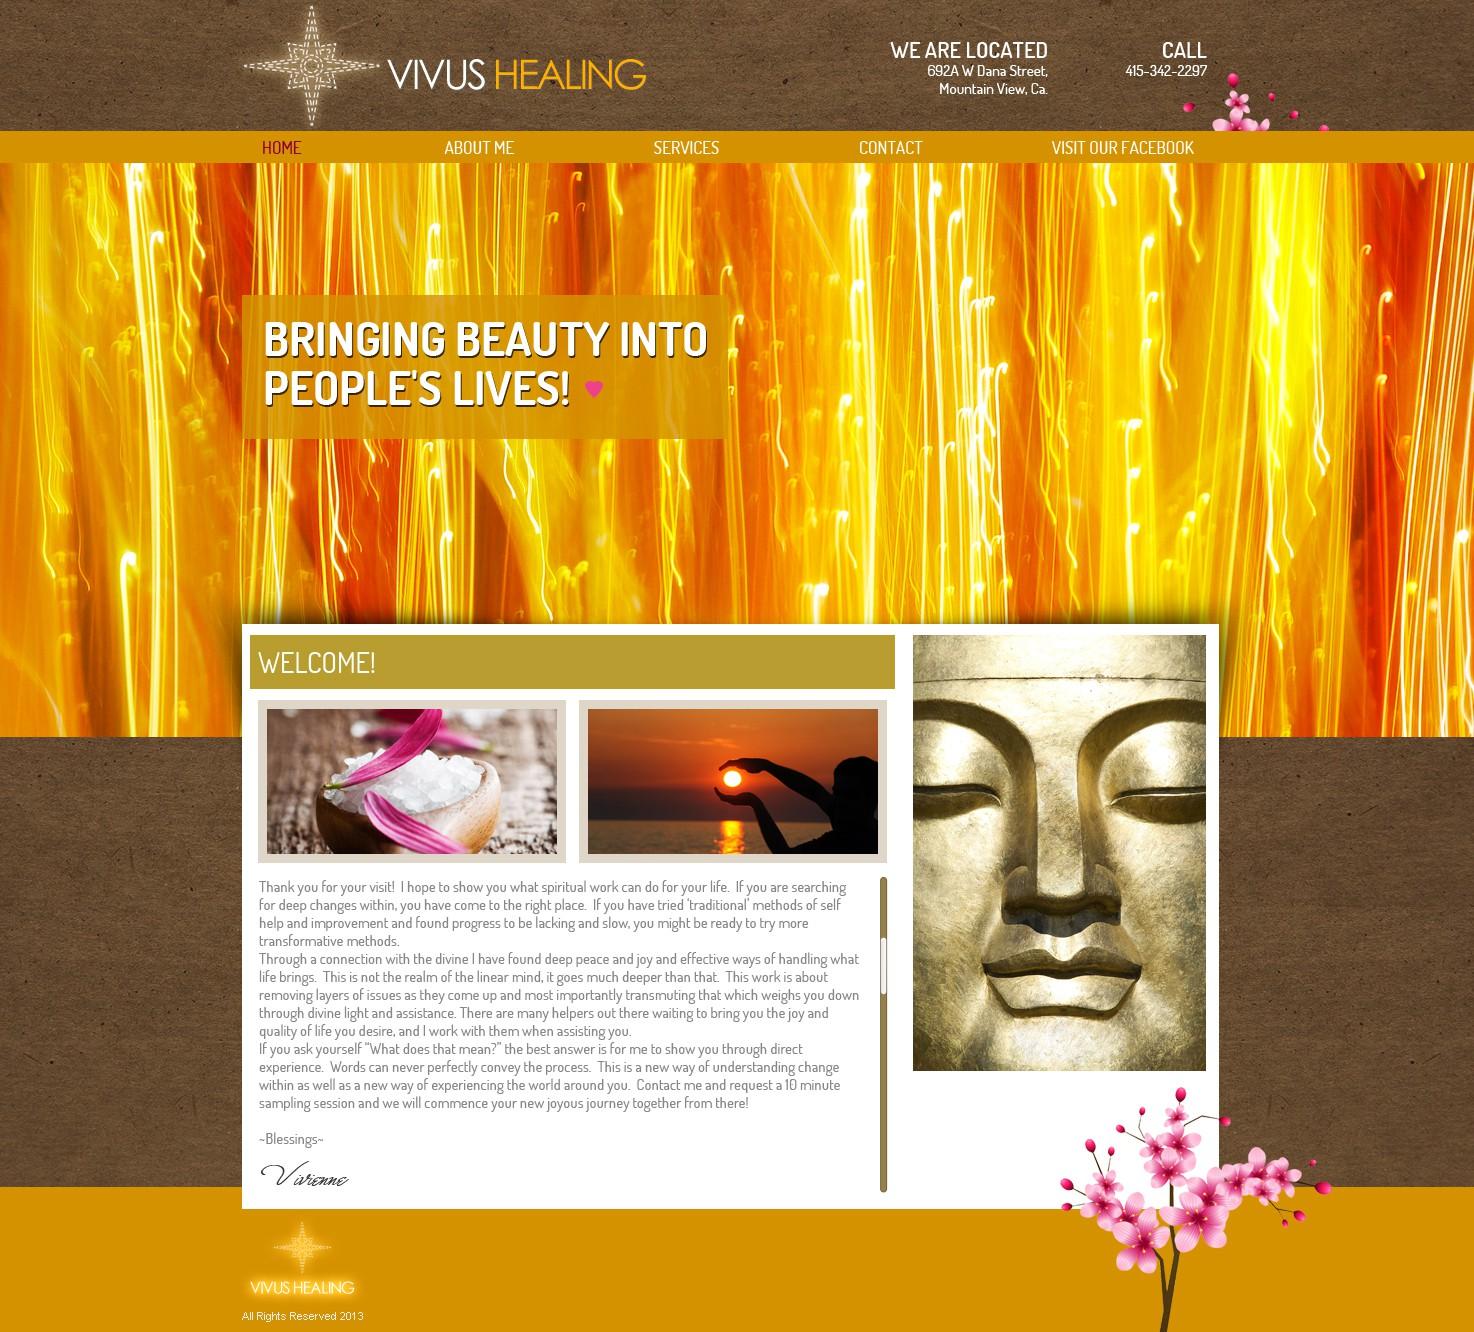 New website design wanted for Vivus Healing